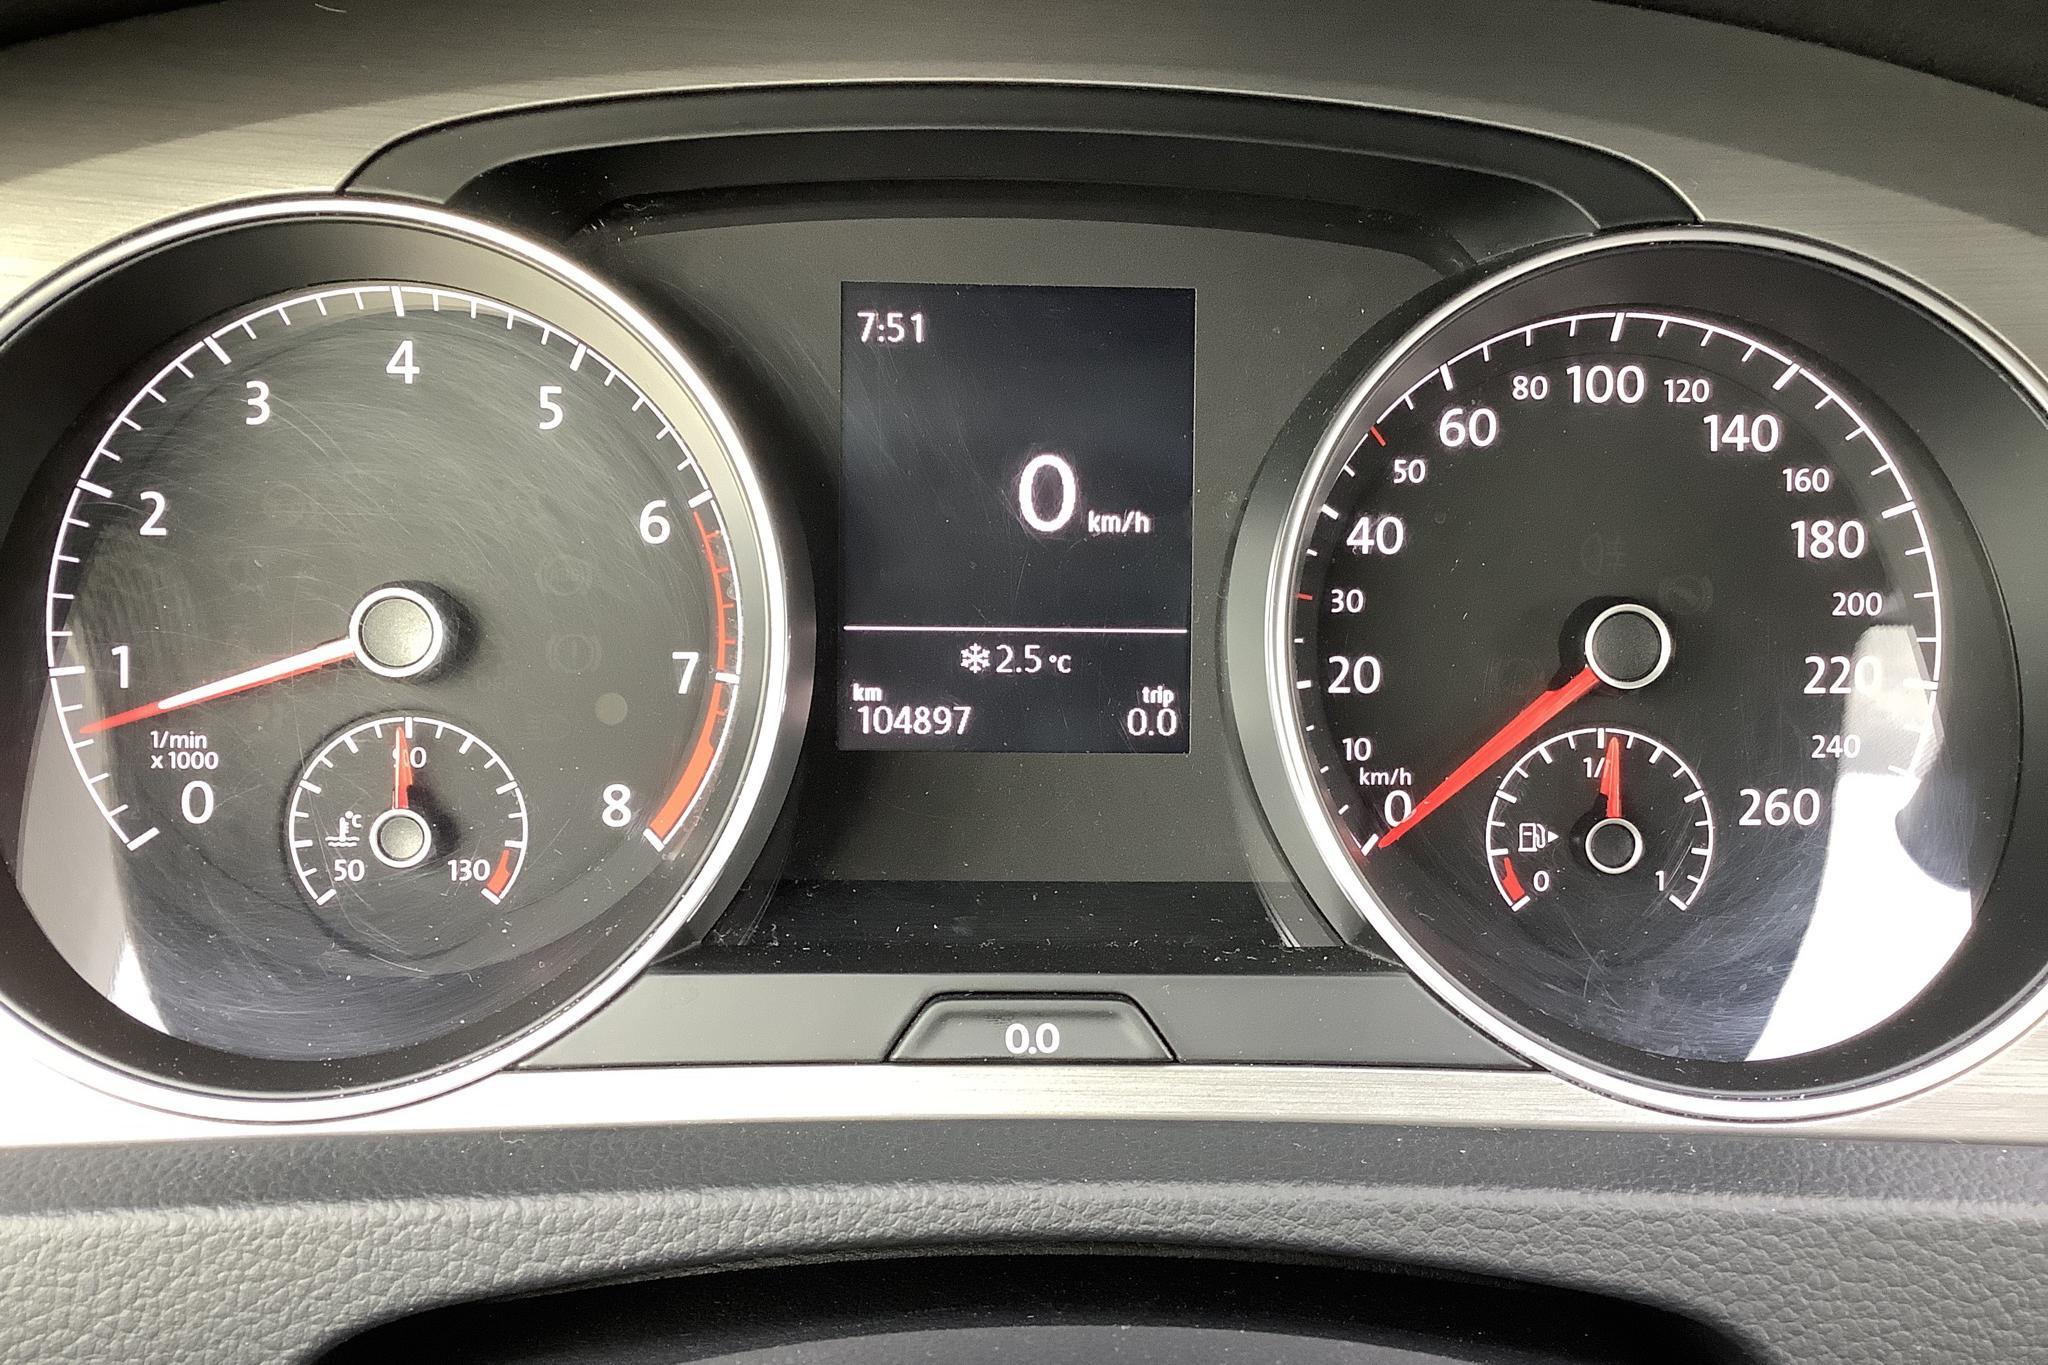 VW Golf VII 1.4 TSI Multifuel 5dr (122hk) - 104 890 km - Manual - blue - 2014